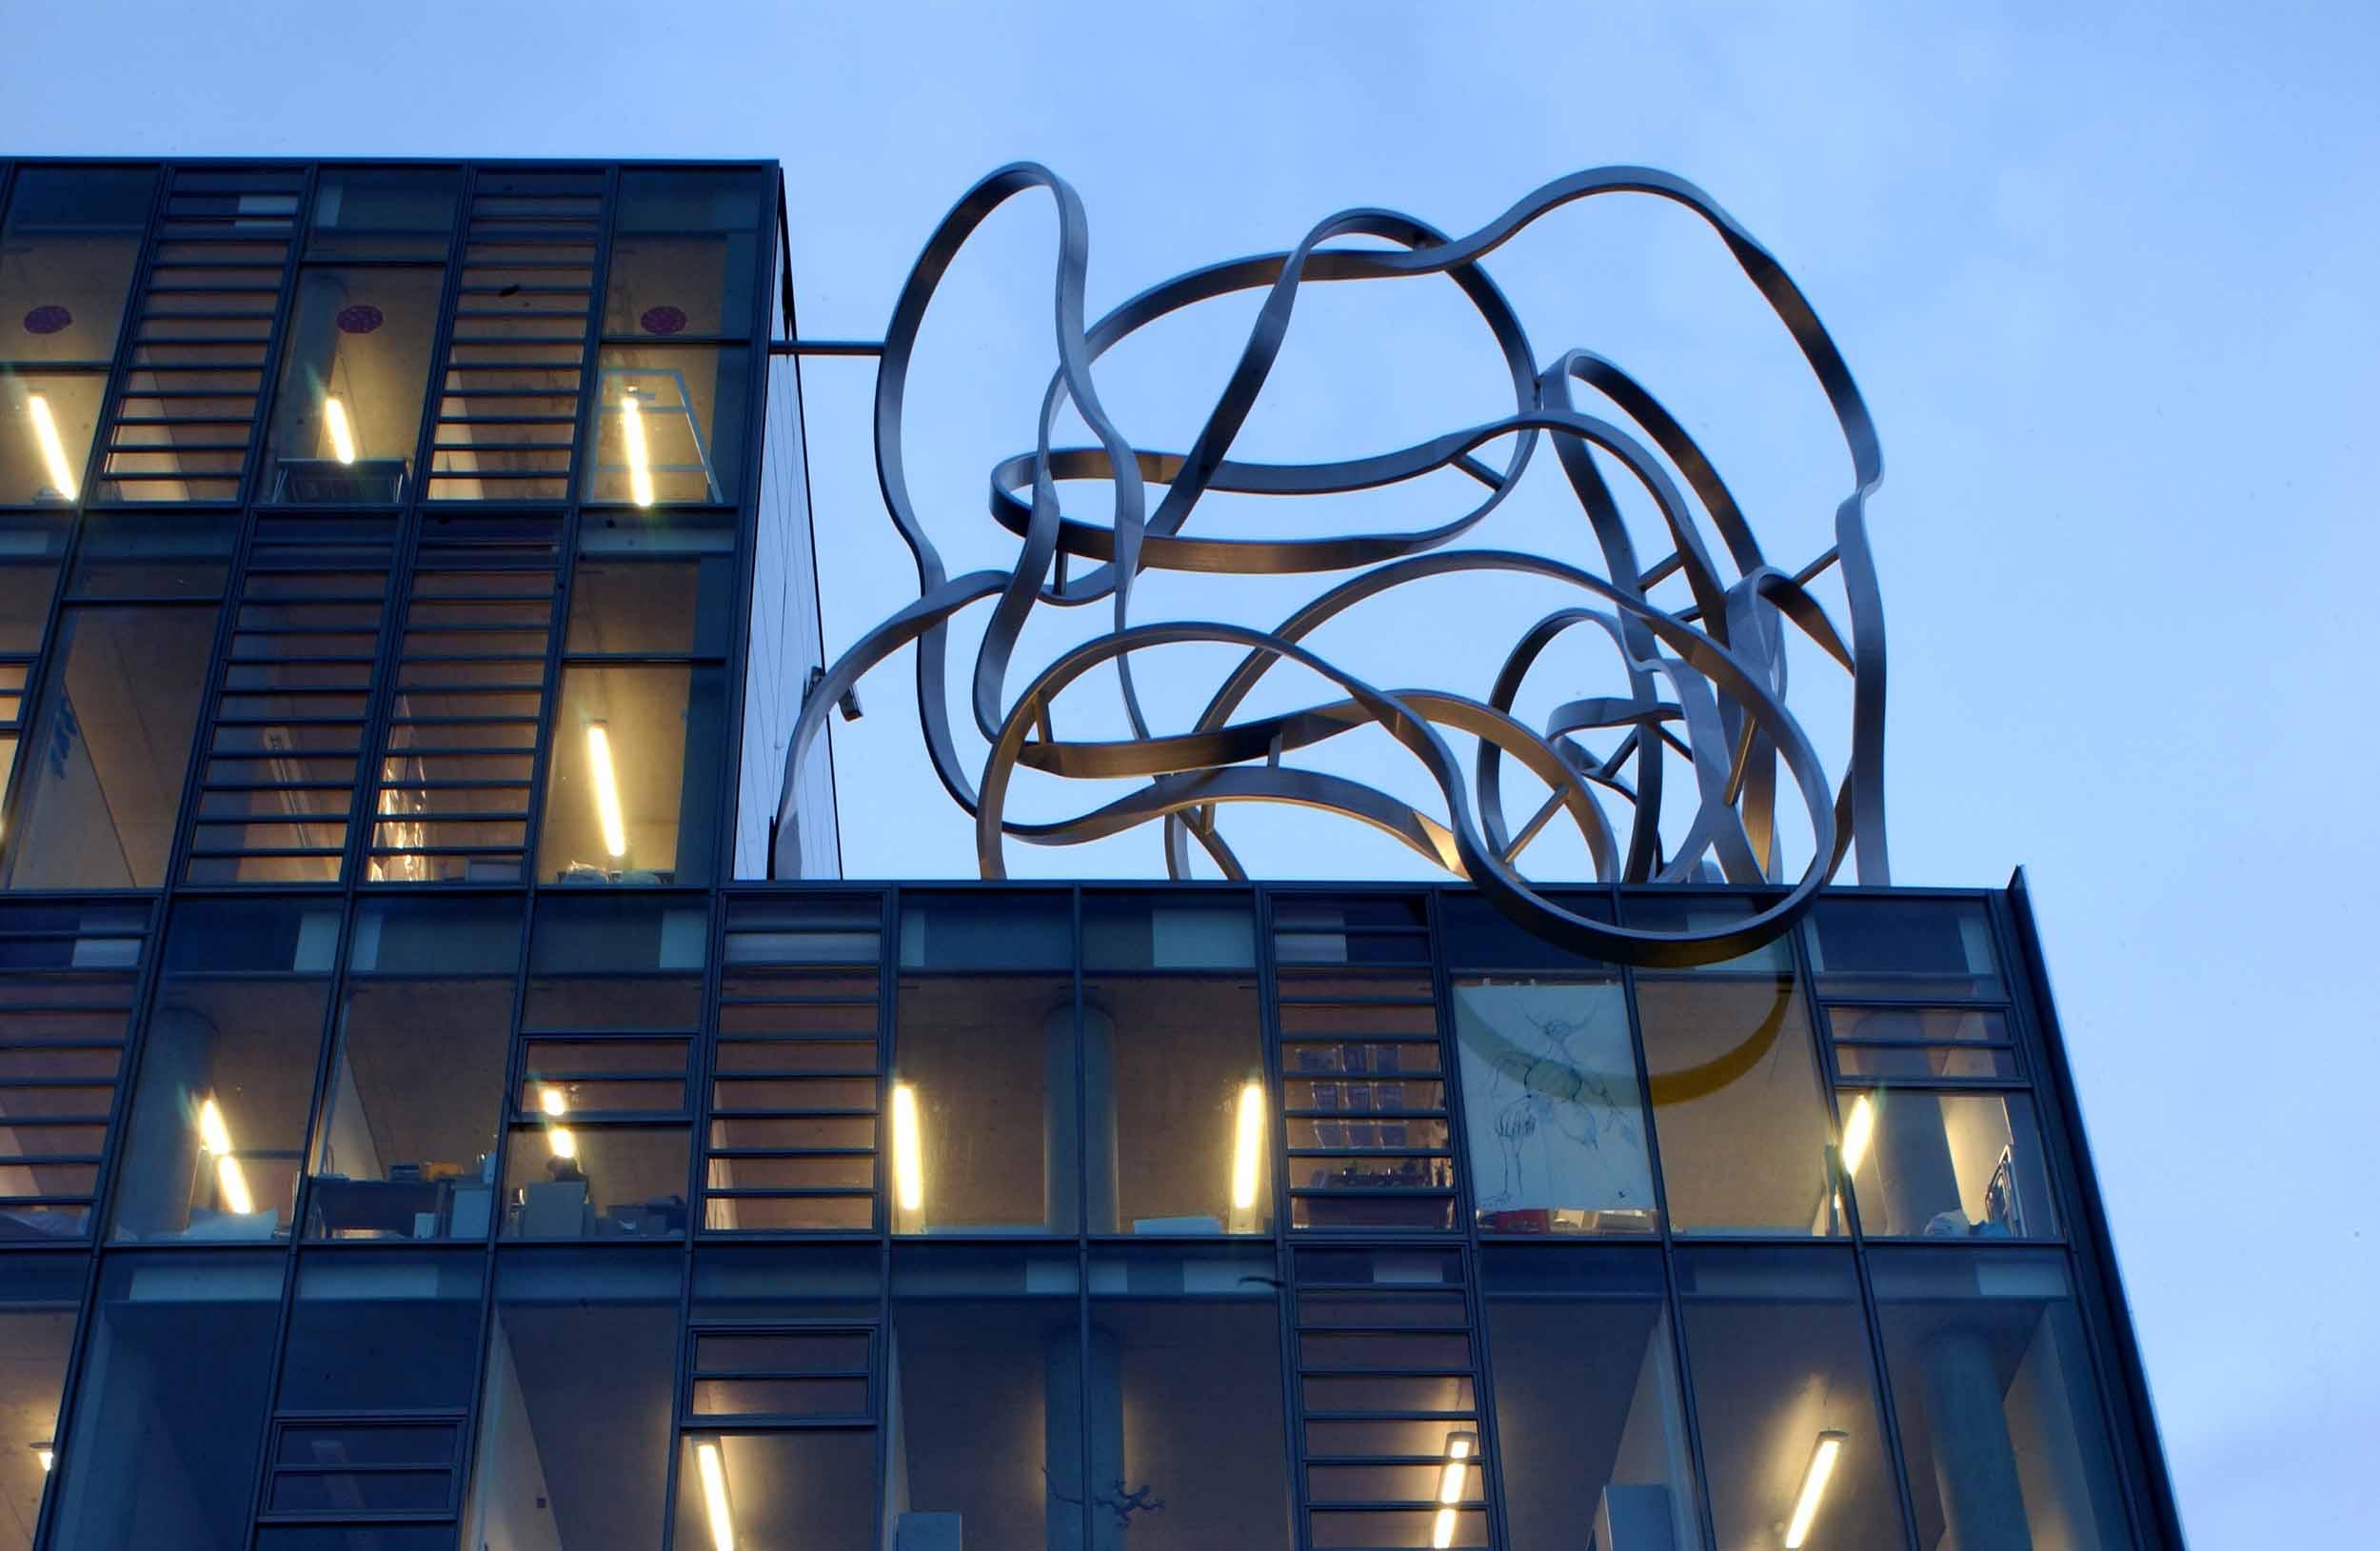 Goldsmiths London UK Roof Sculpture